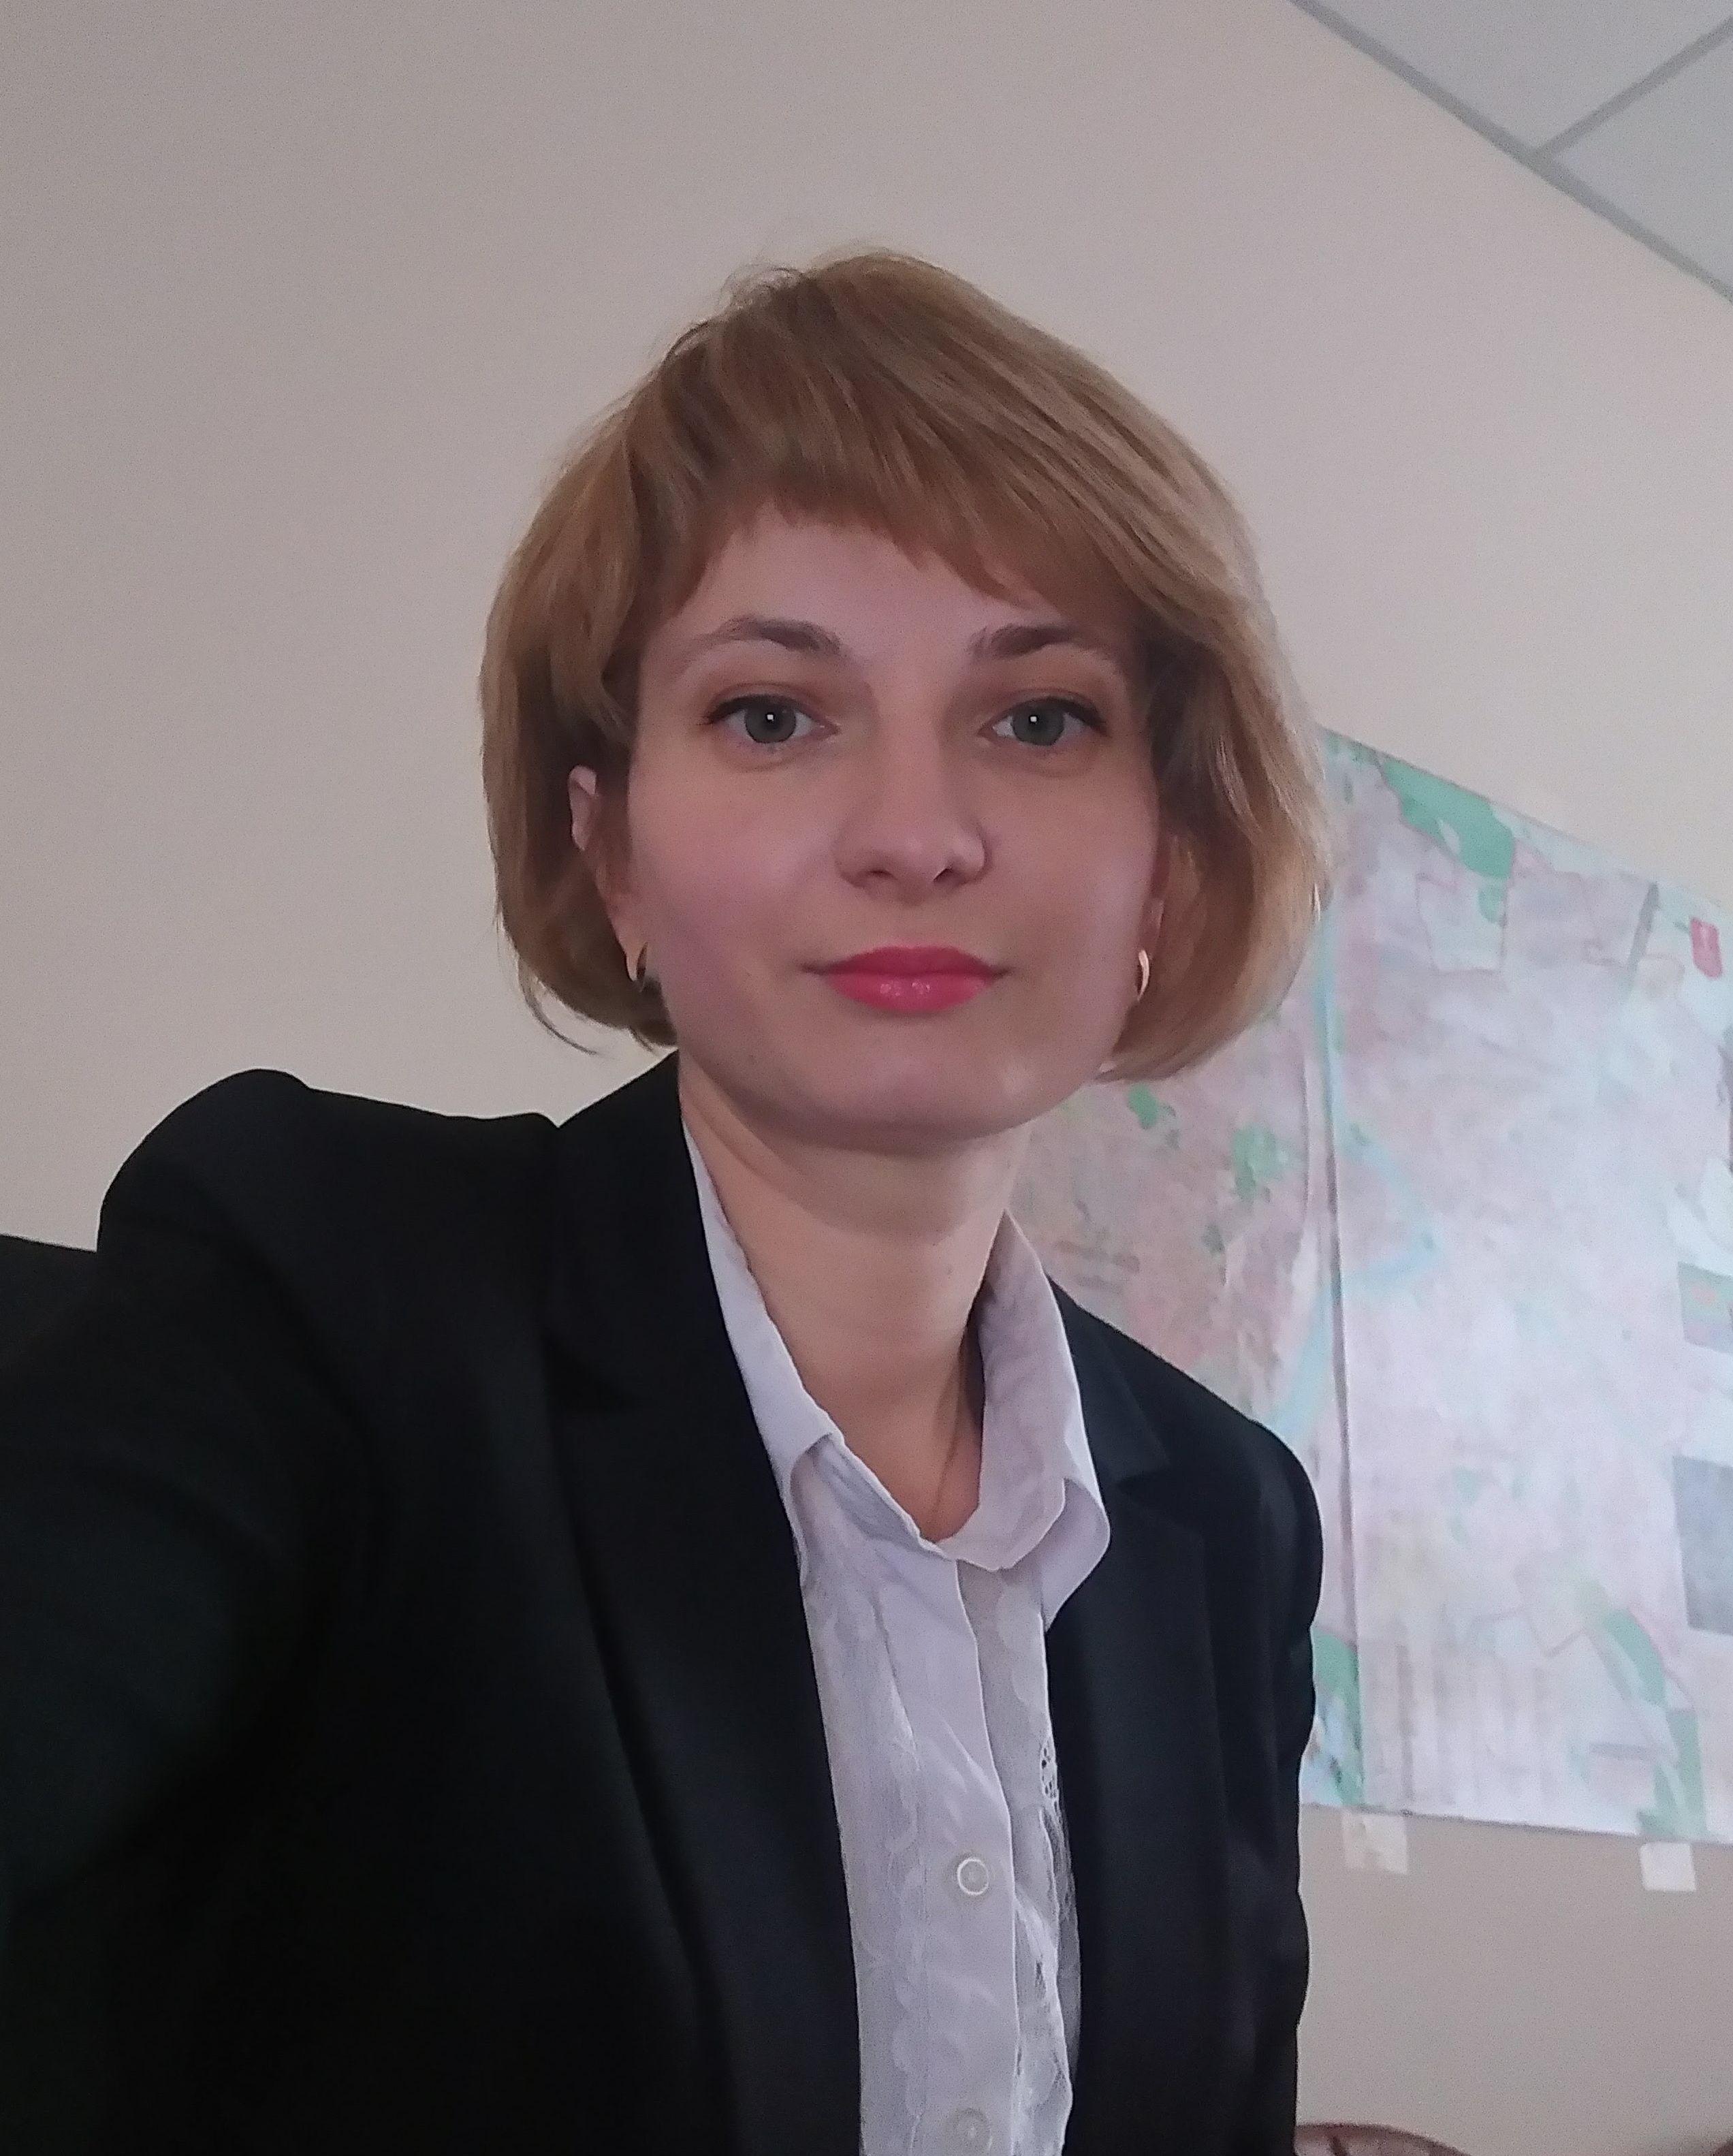 Кириленко Людмила Василівна : Заступник начальника,кандидат с.-г. наук